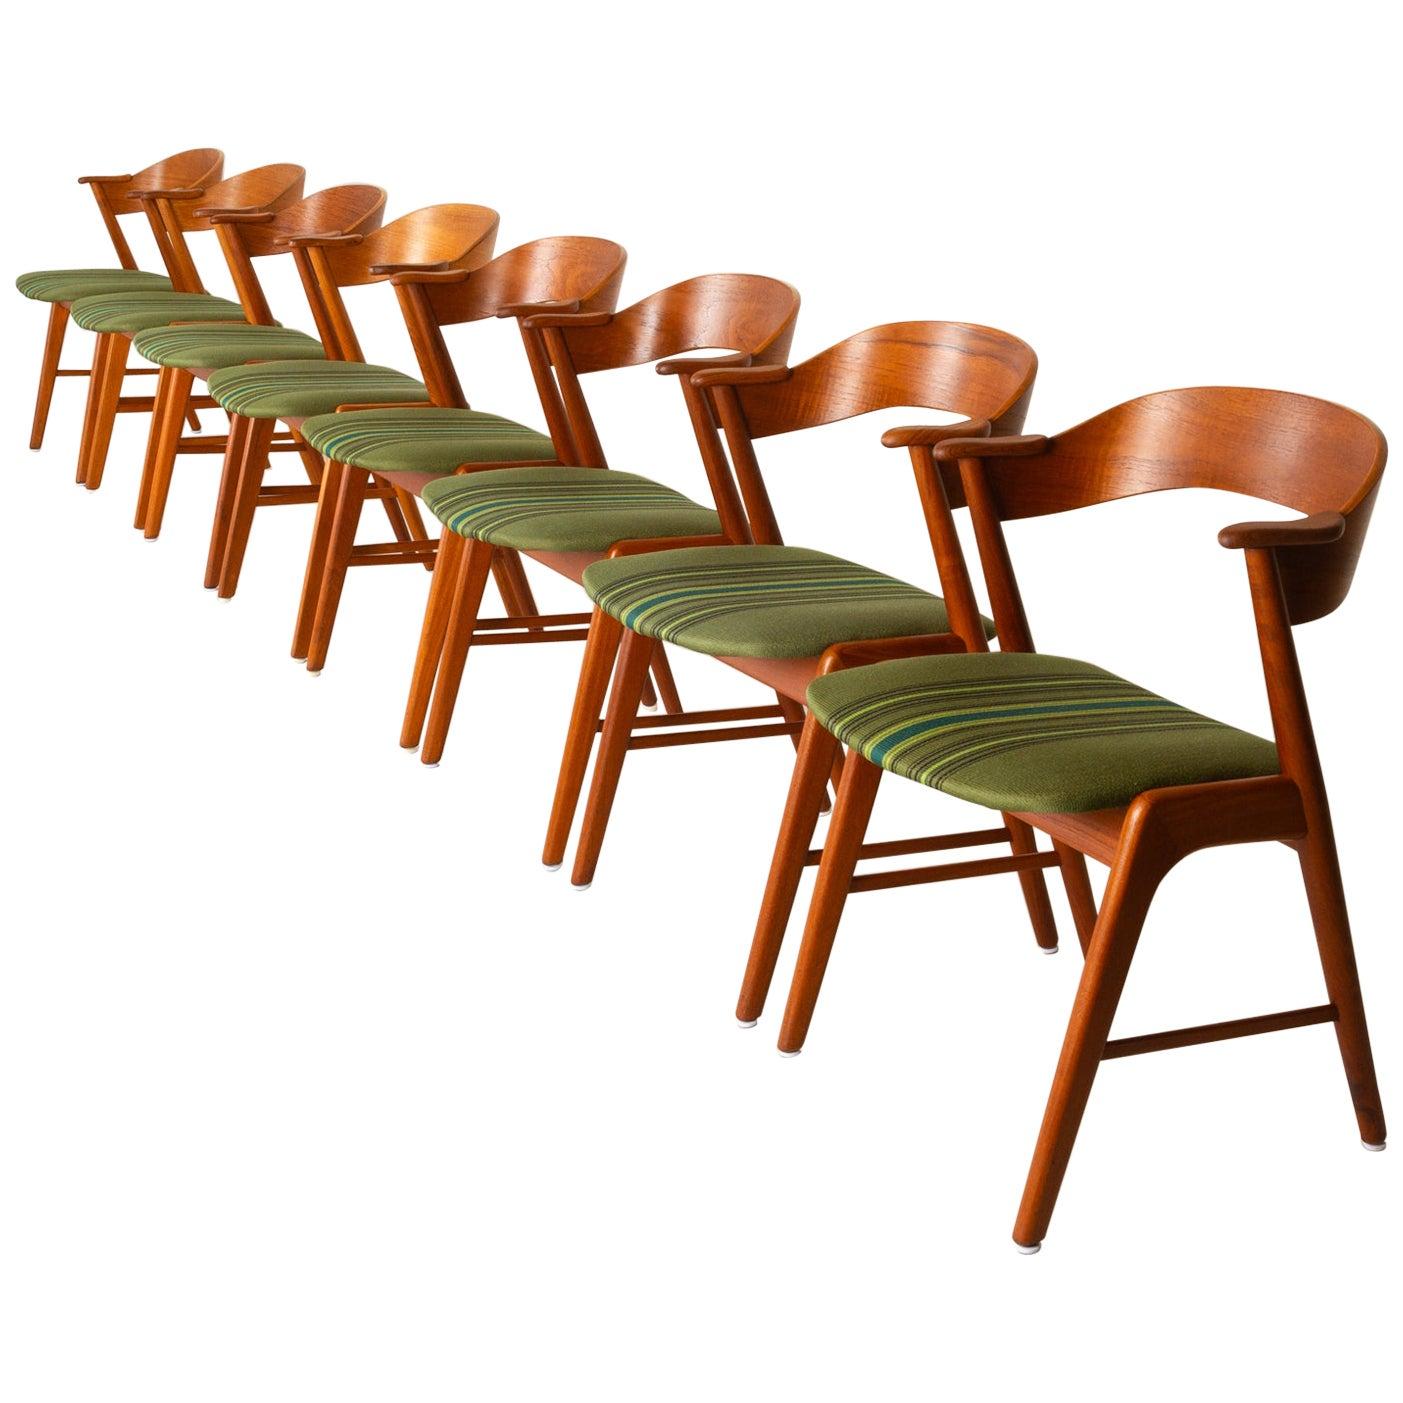 Vintage Danish Teak Dining Chairs by Korup Stolefabrik 1960s Set of 8